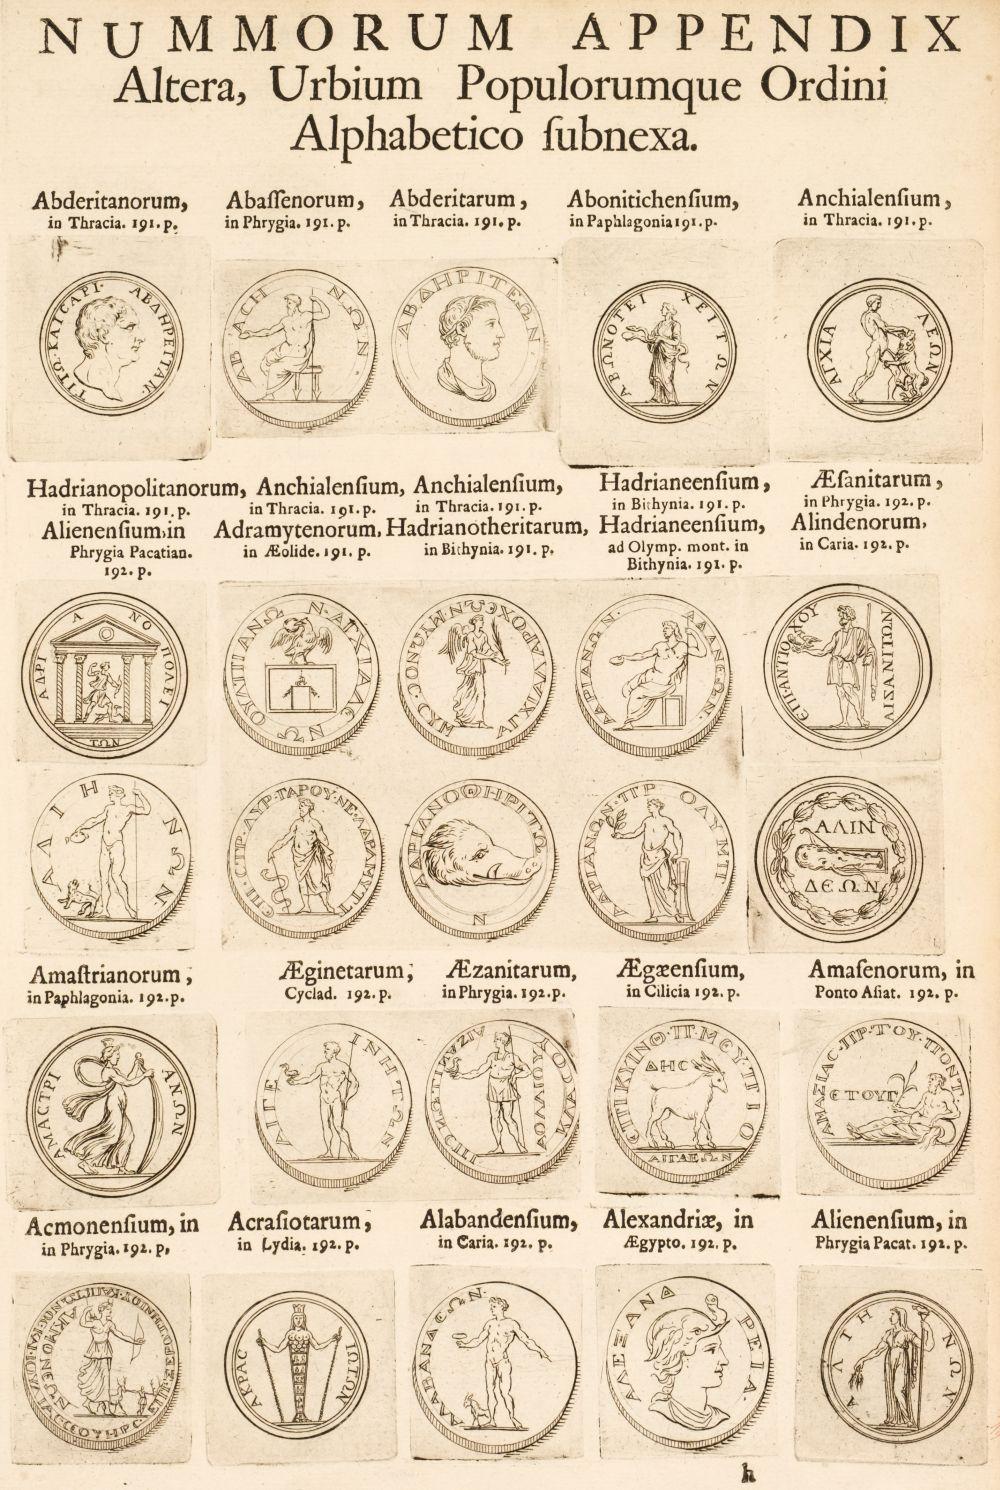 Foy-Vaillant (Jean). Numismata Imperatorum, 1700